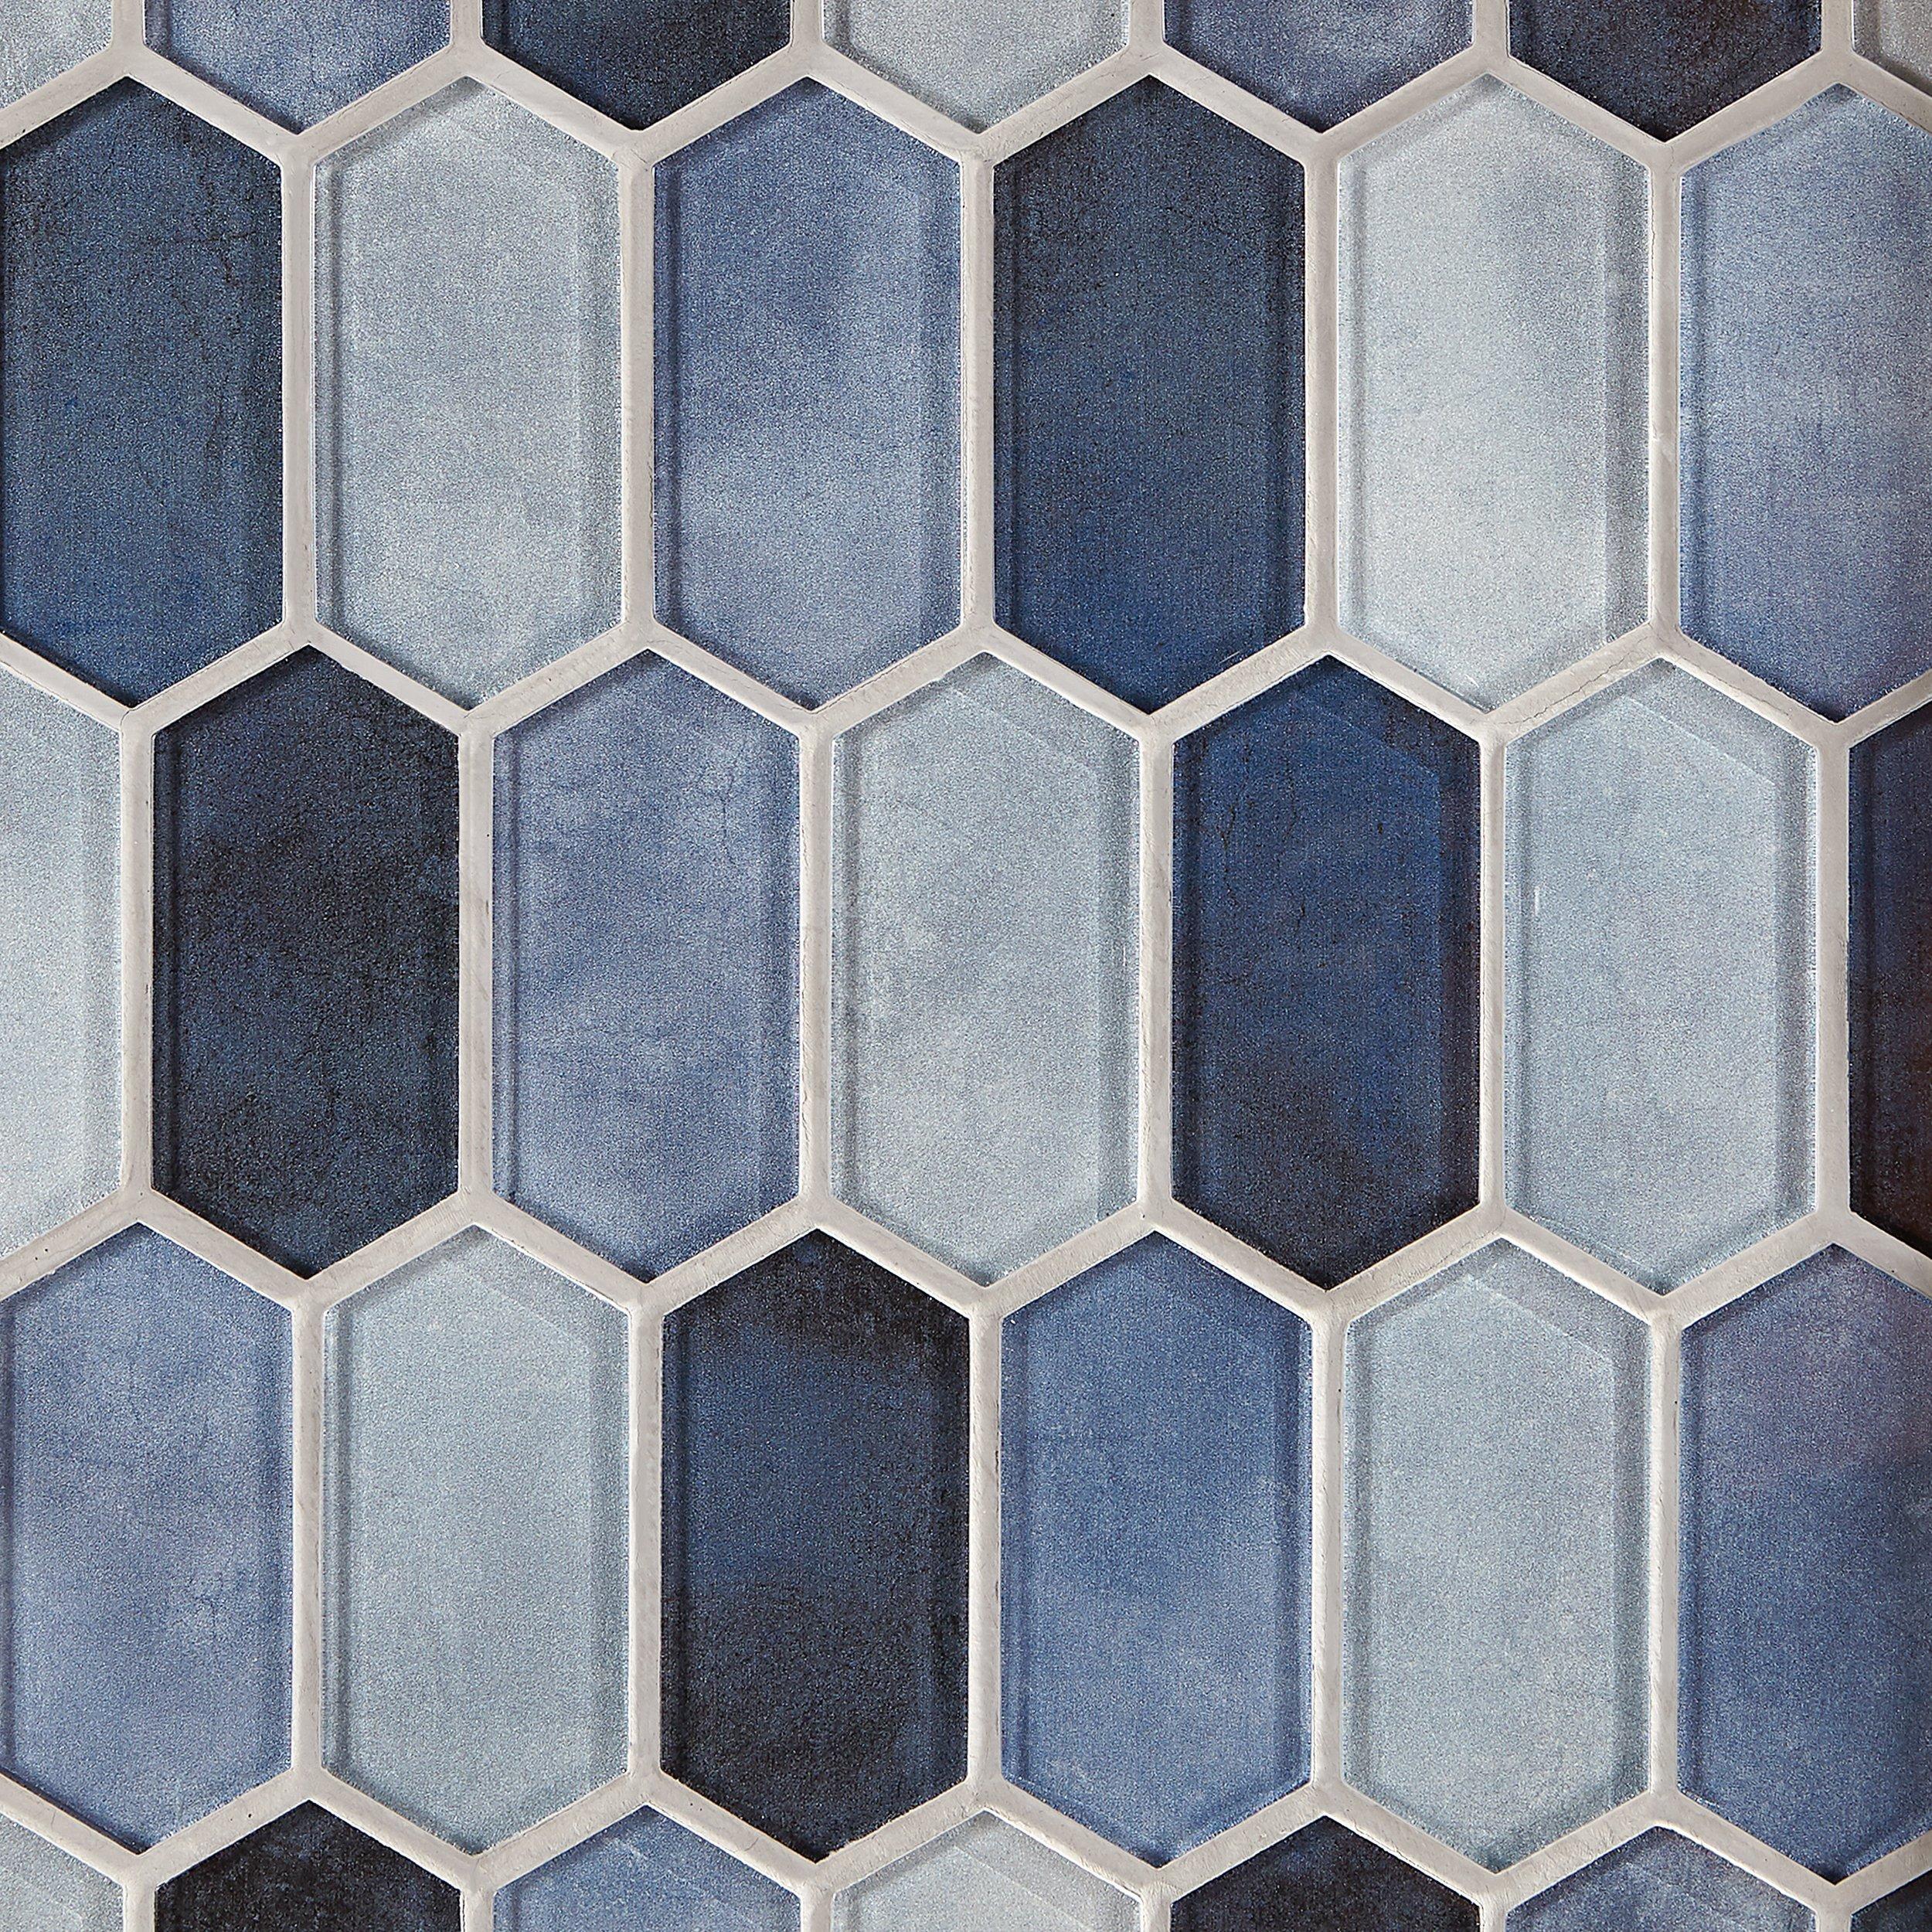 Decorative Glass Tile | Floor & Decor